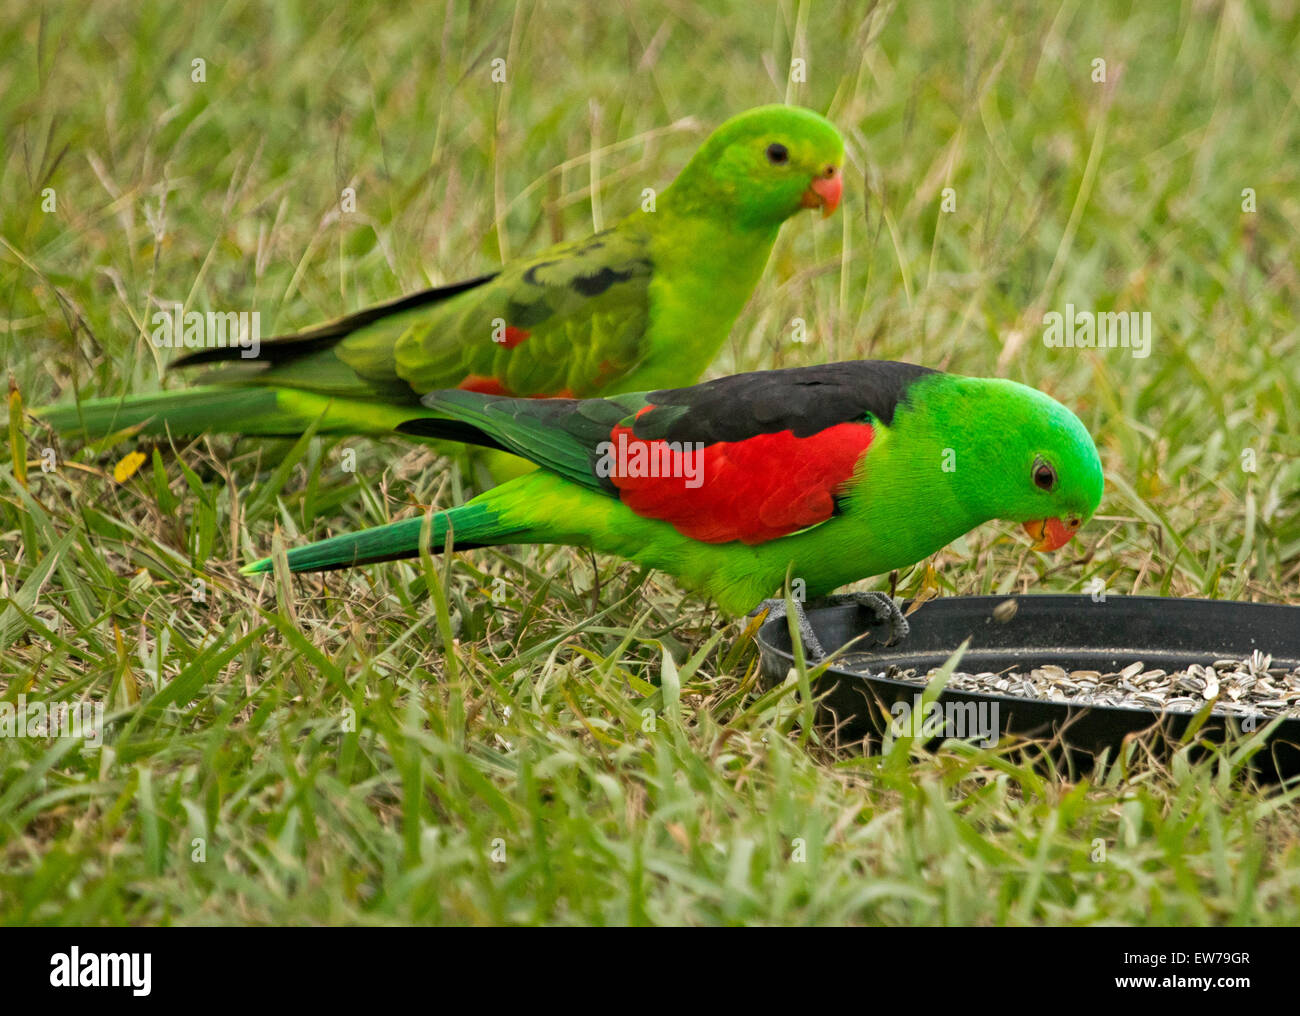 Spectacular male and female red-winged parrots Aprosmictus erythropterus, Australian native birds at bird feeding - Stock Image